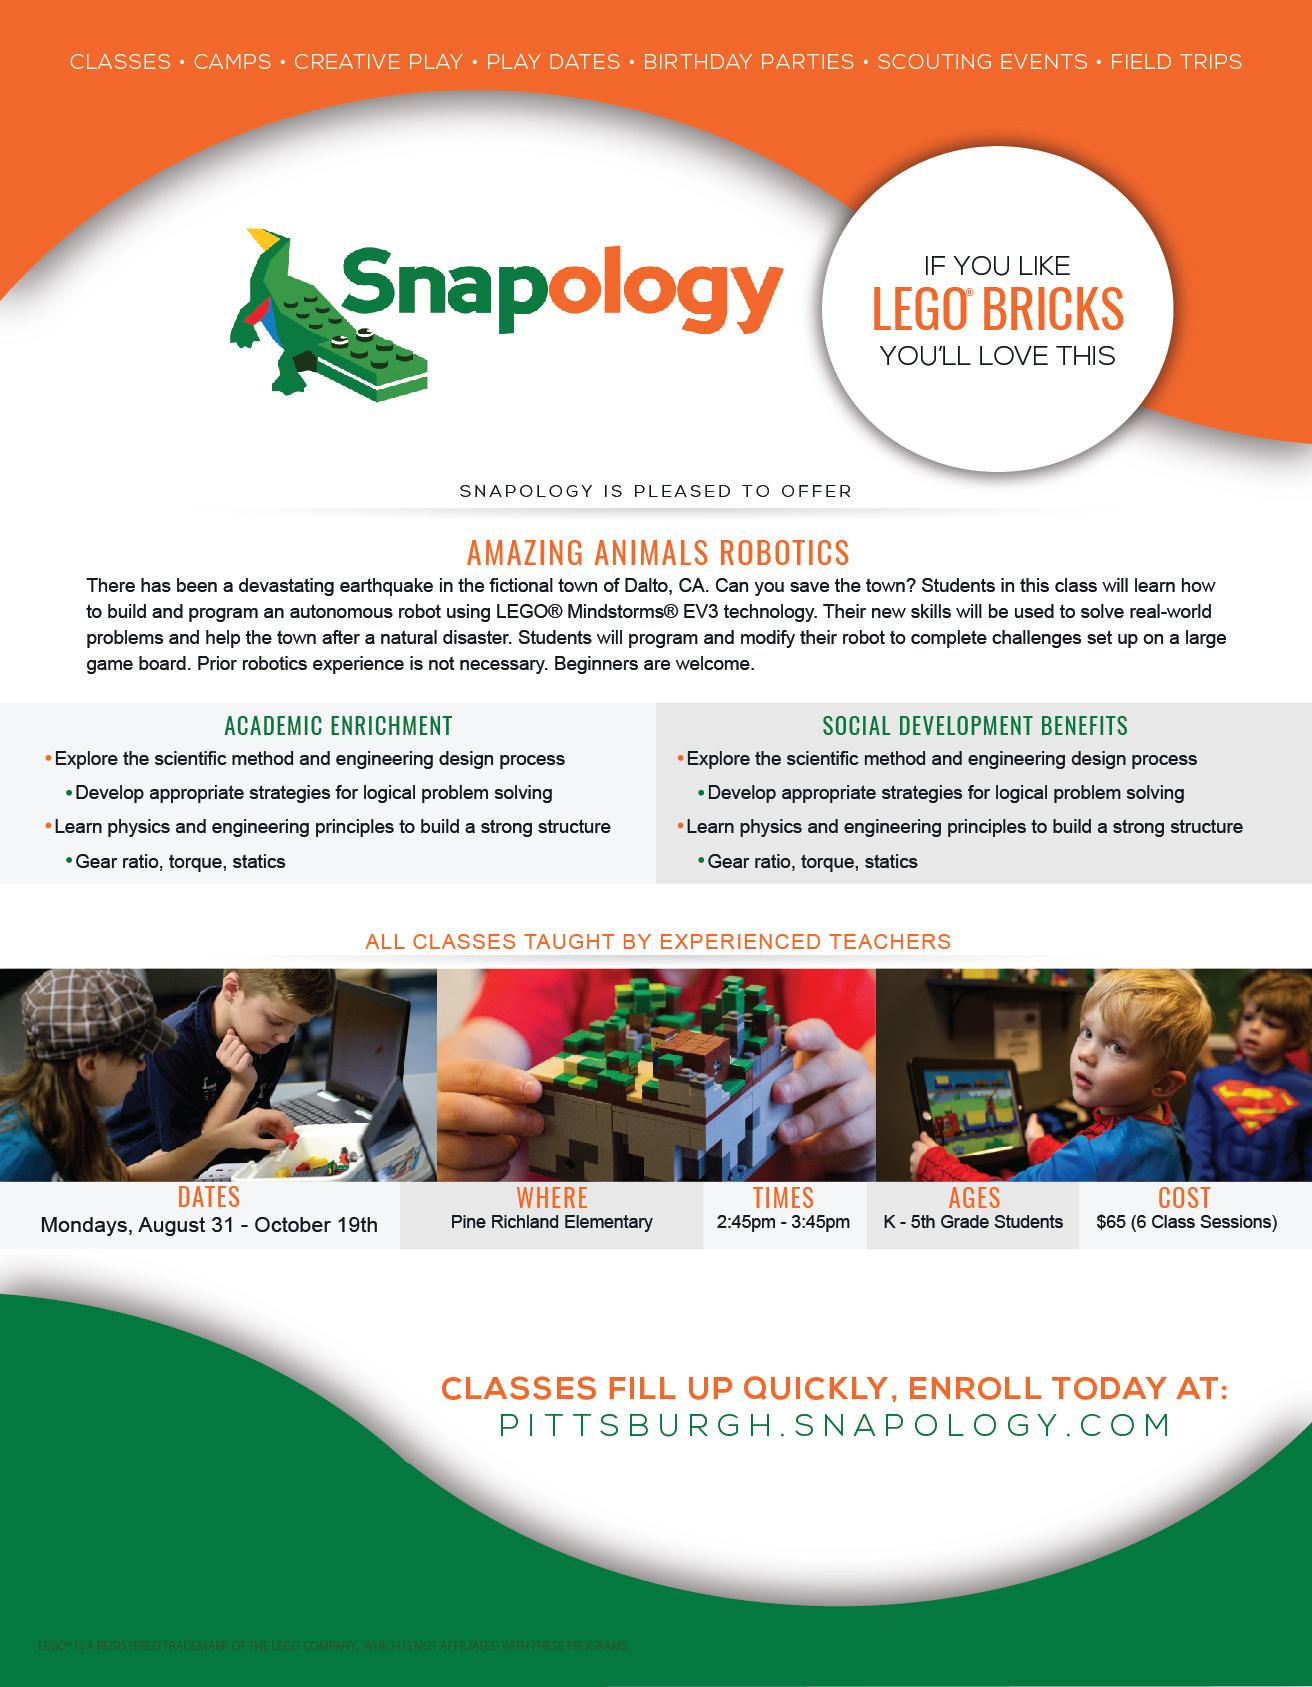 Snapology-FlyerTemplate_Flyer 1 Class.jpg